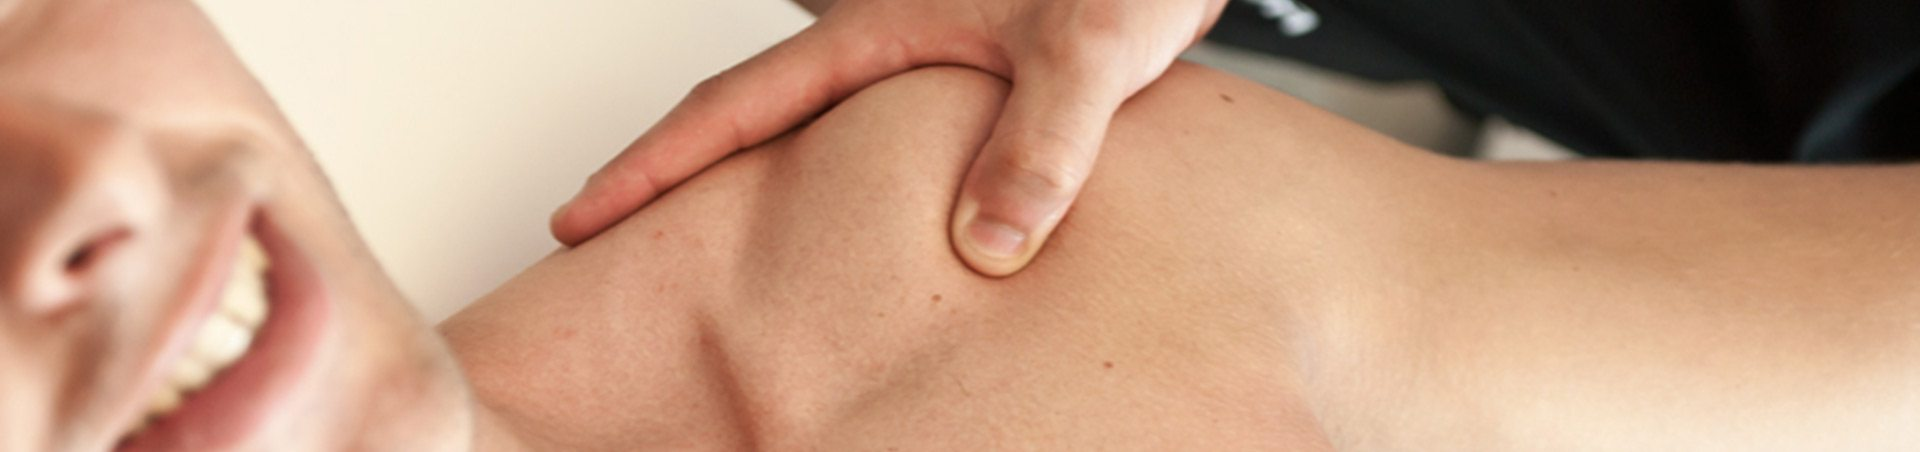 Fisioterapia i Osteopatía